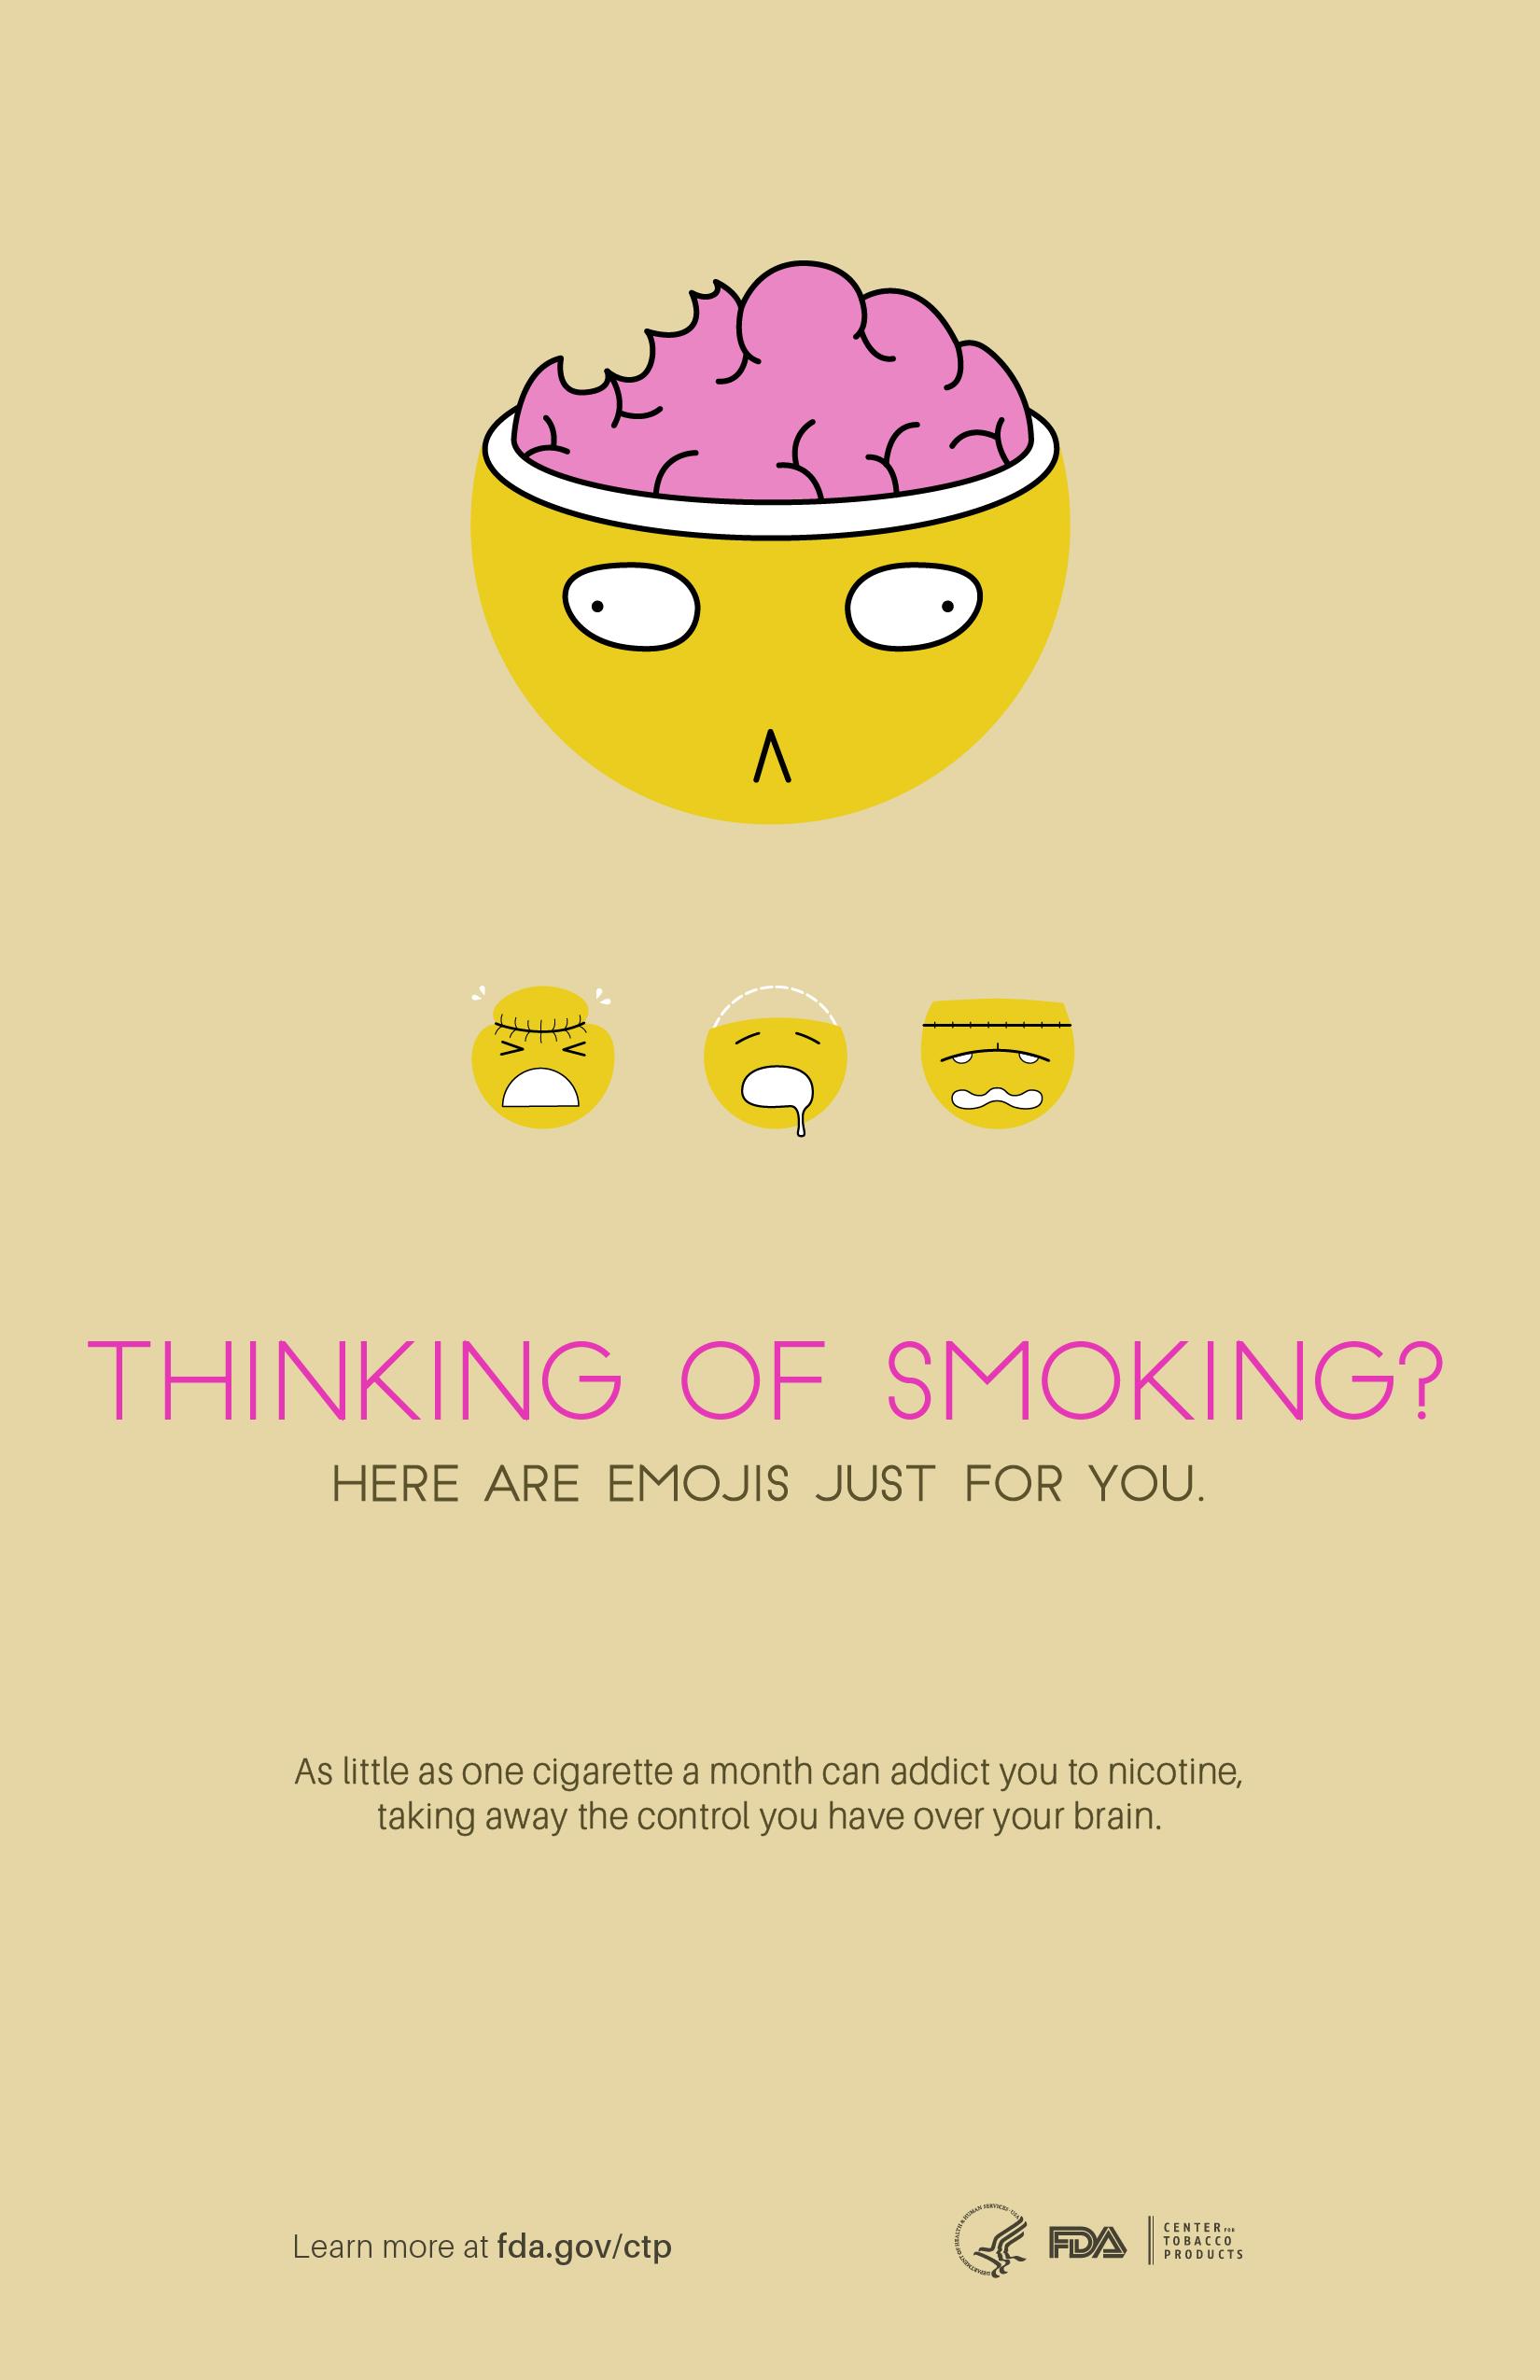 FDA_CTP_Emoji_Addiction_v44.jpg